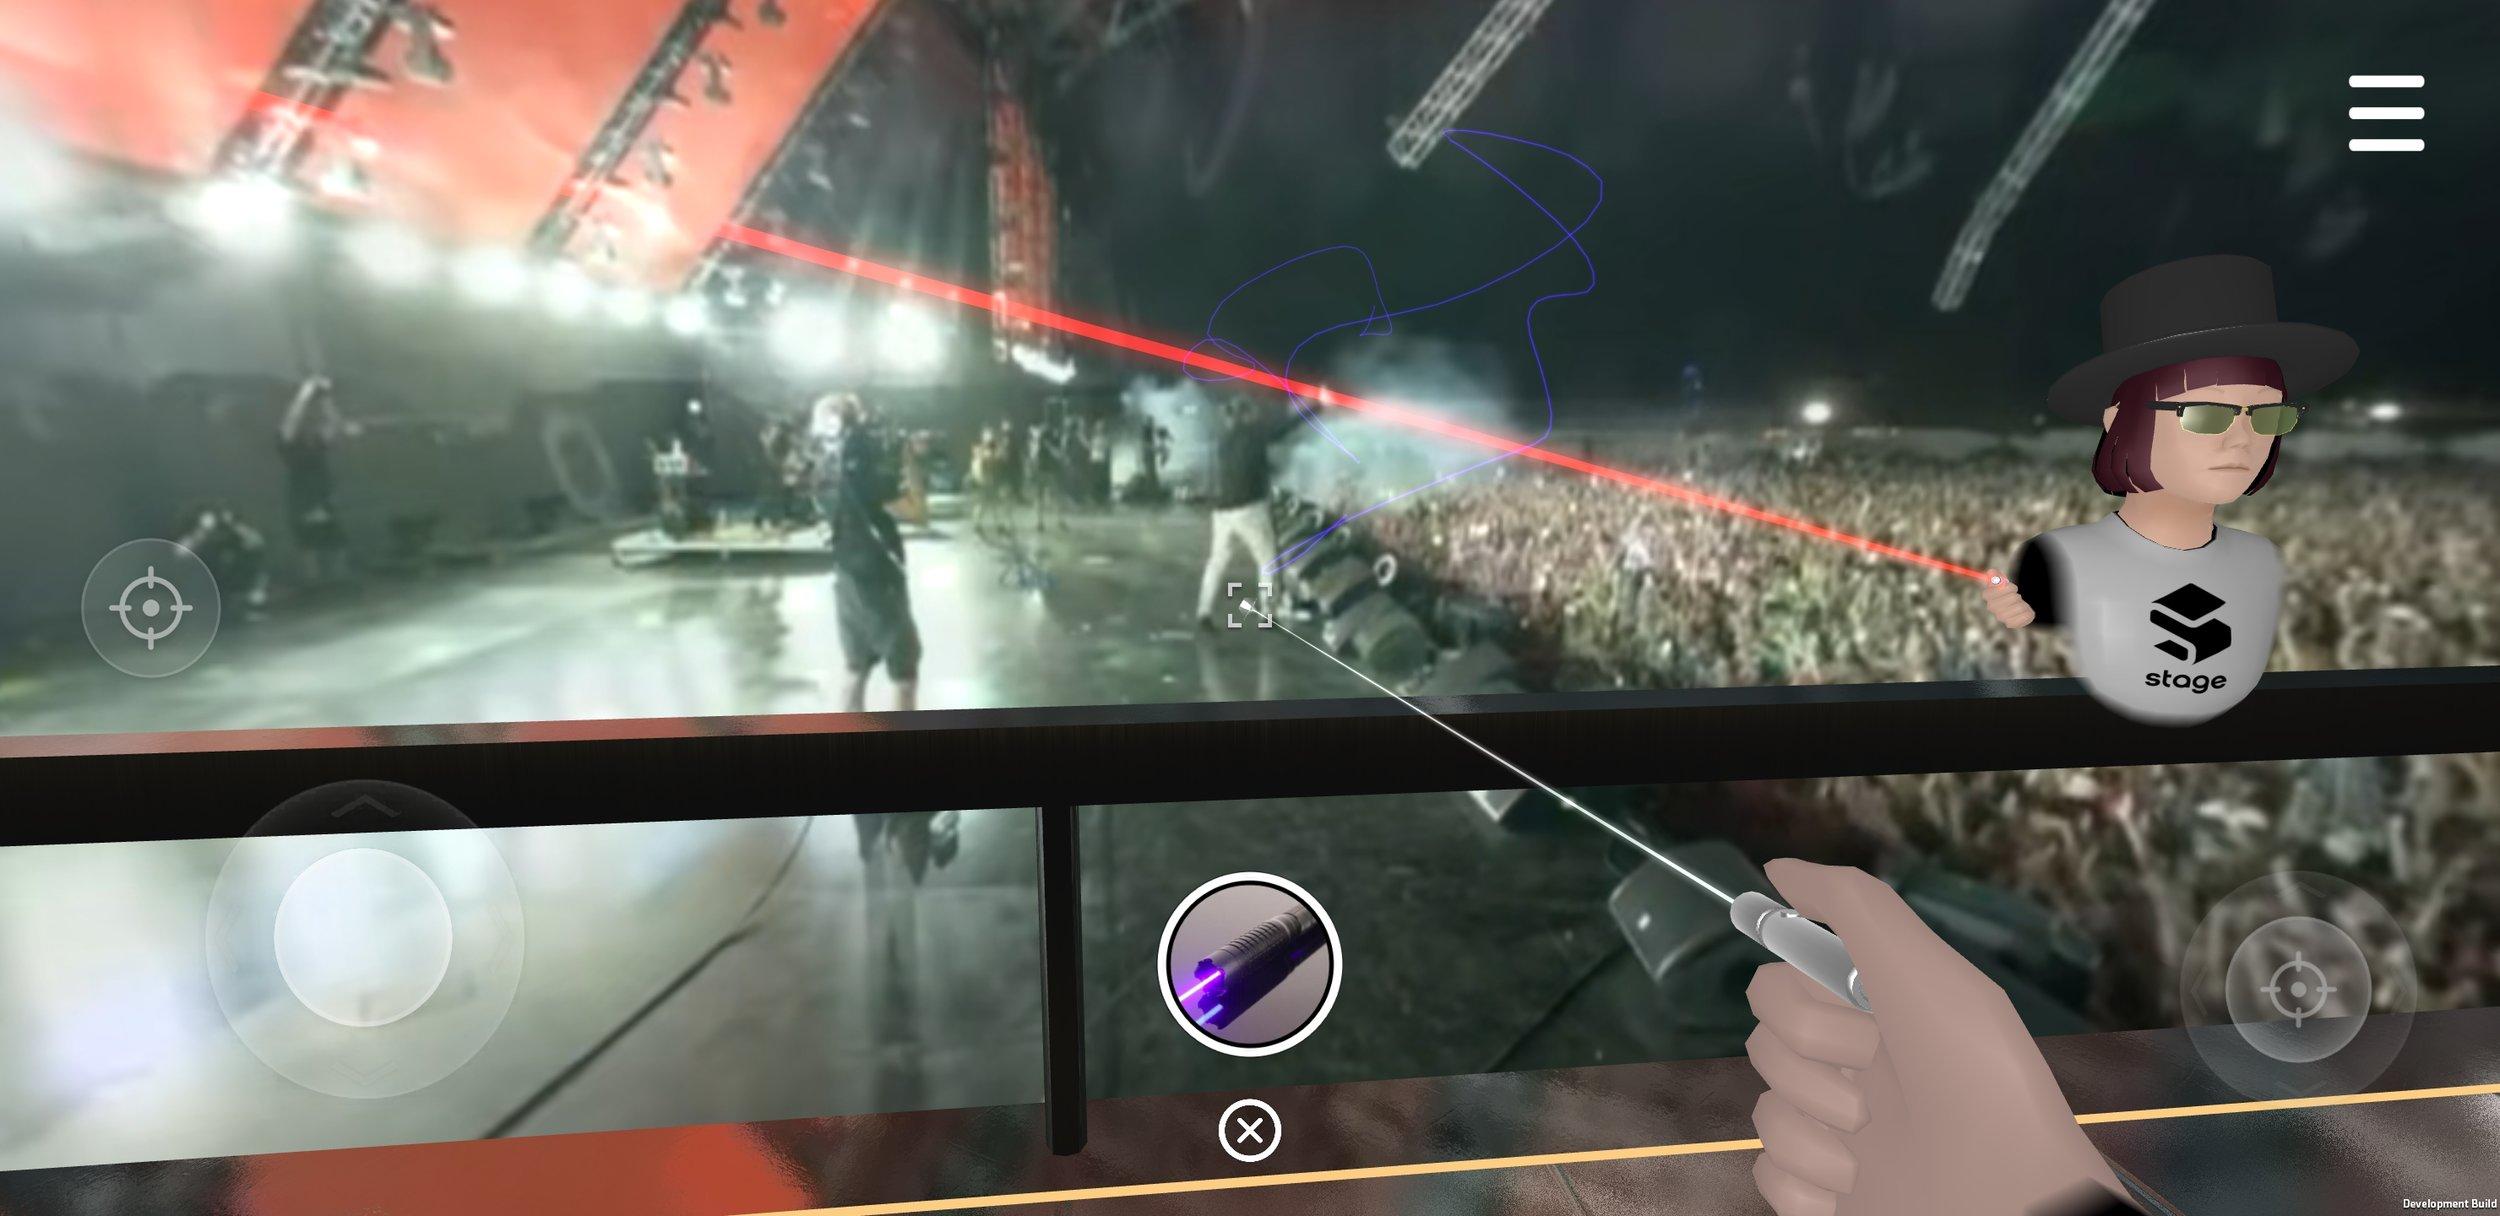 Screenshot_20190803-162851_Stage.jpg